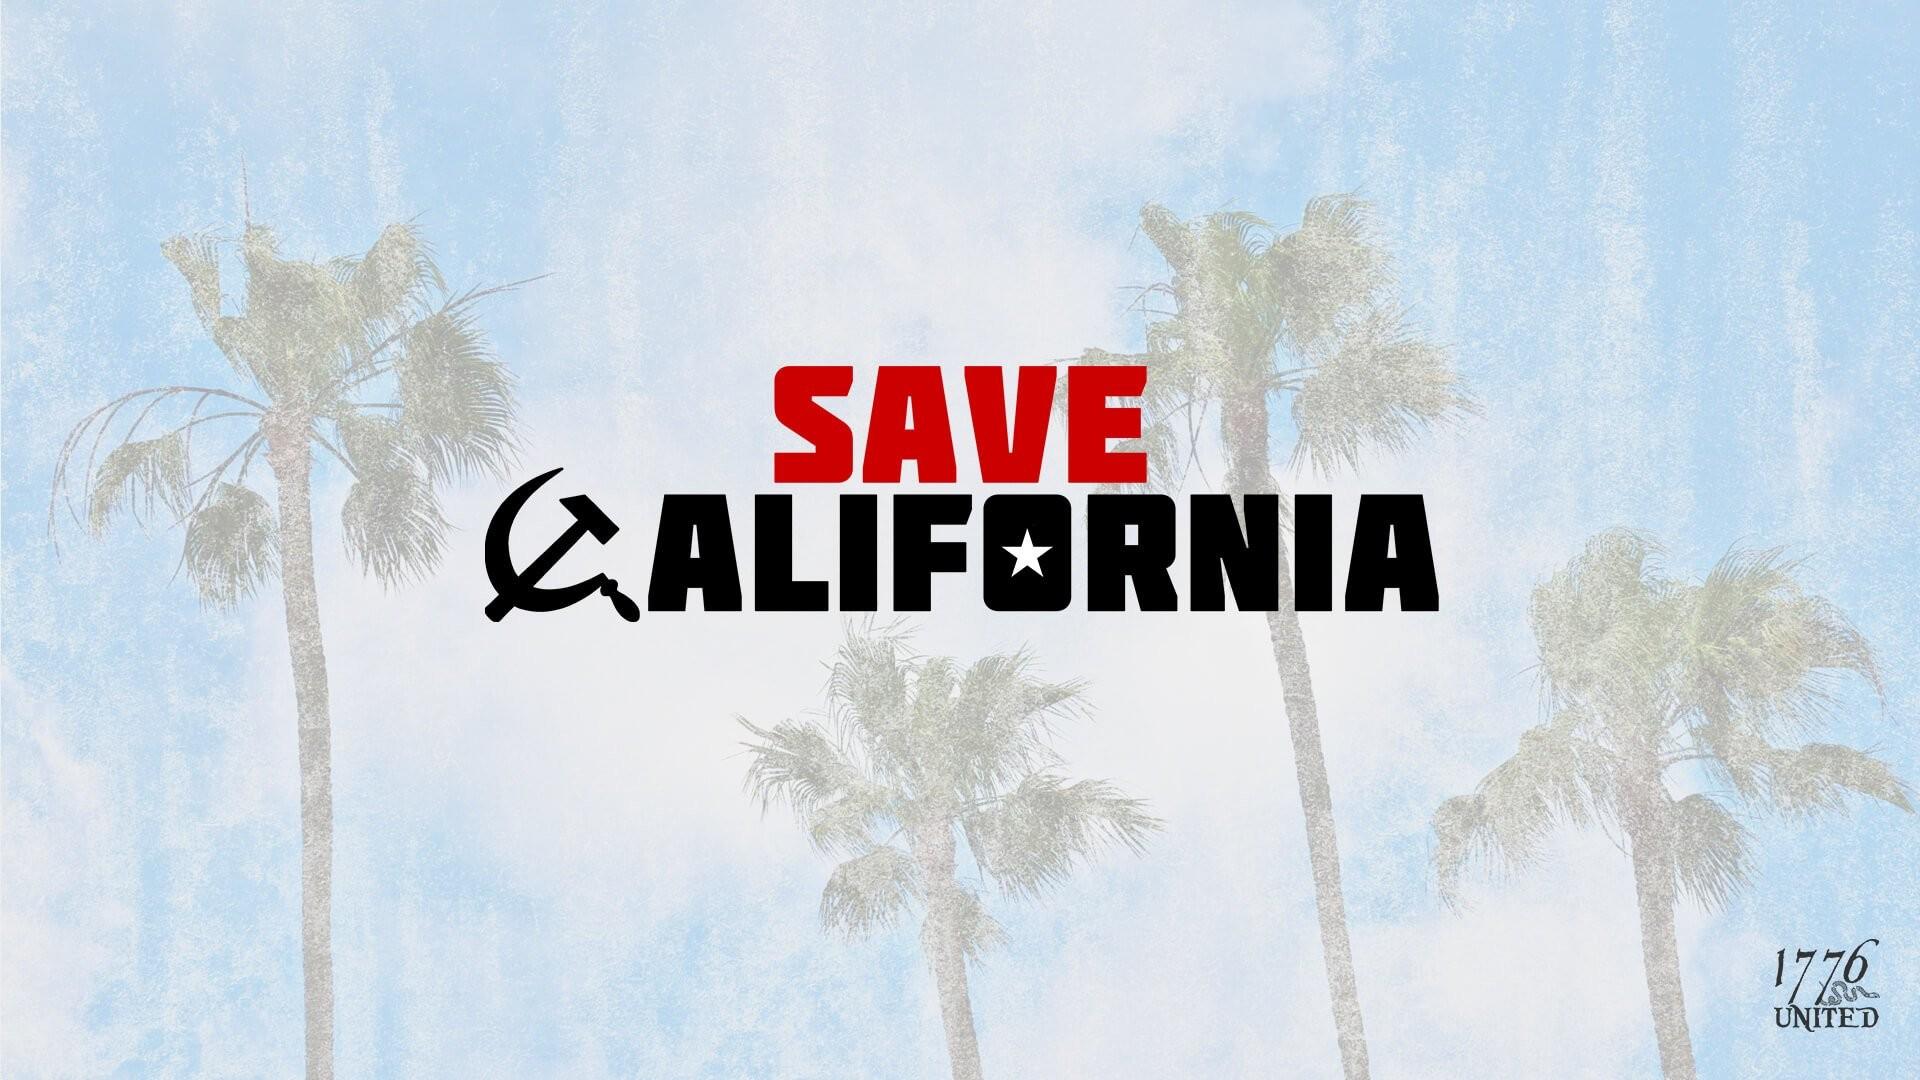 … Flag Patriotic Desktop Wallpaper 1776 United Save California Patriotic  Desktop Wallpaper …